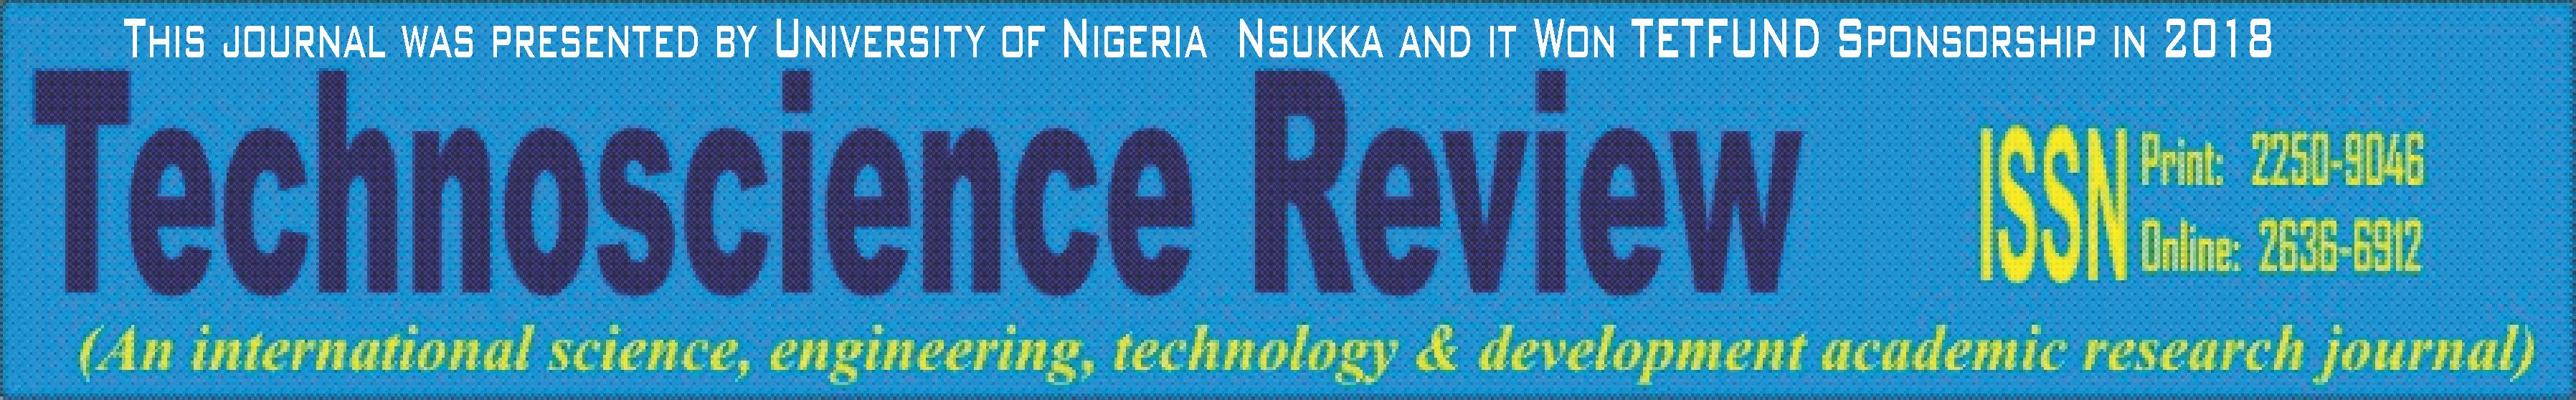 technoscience review header